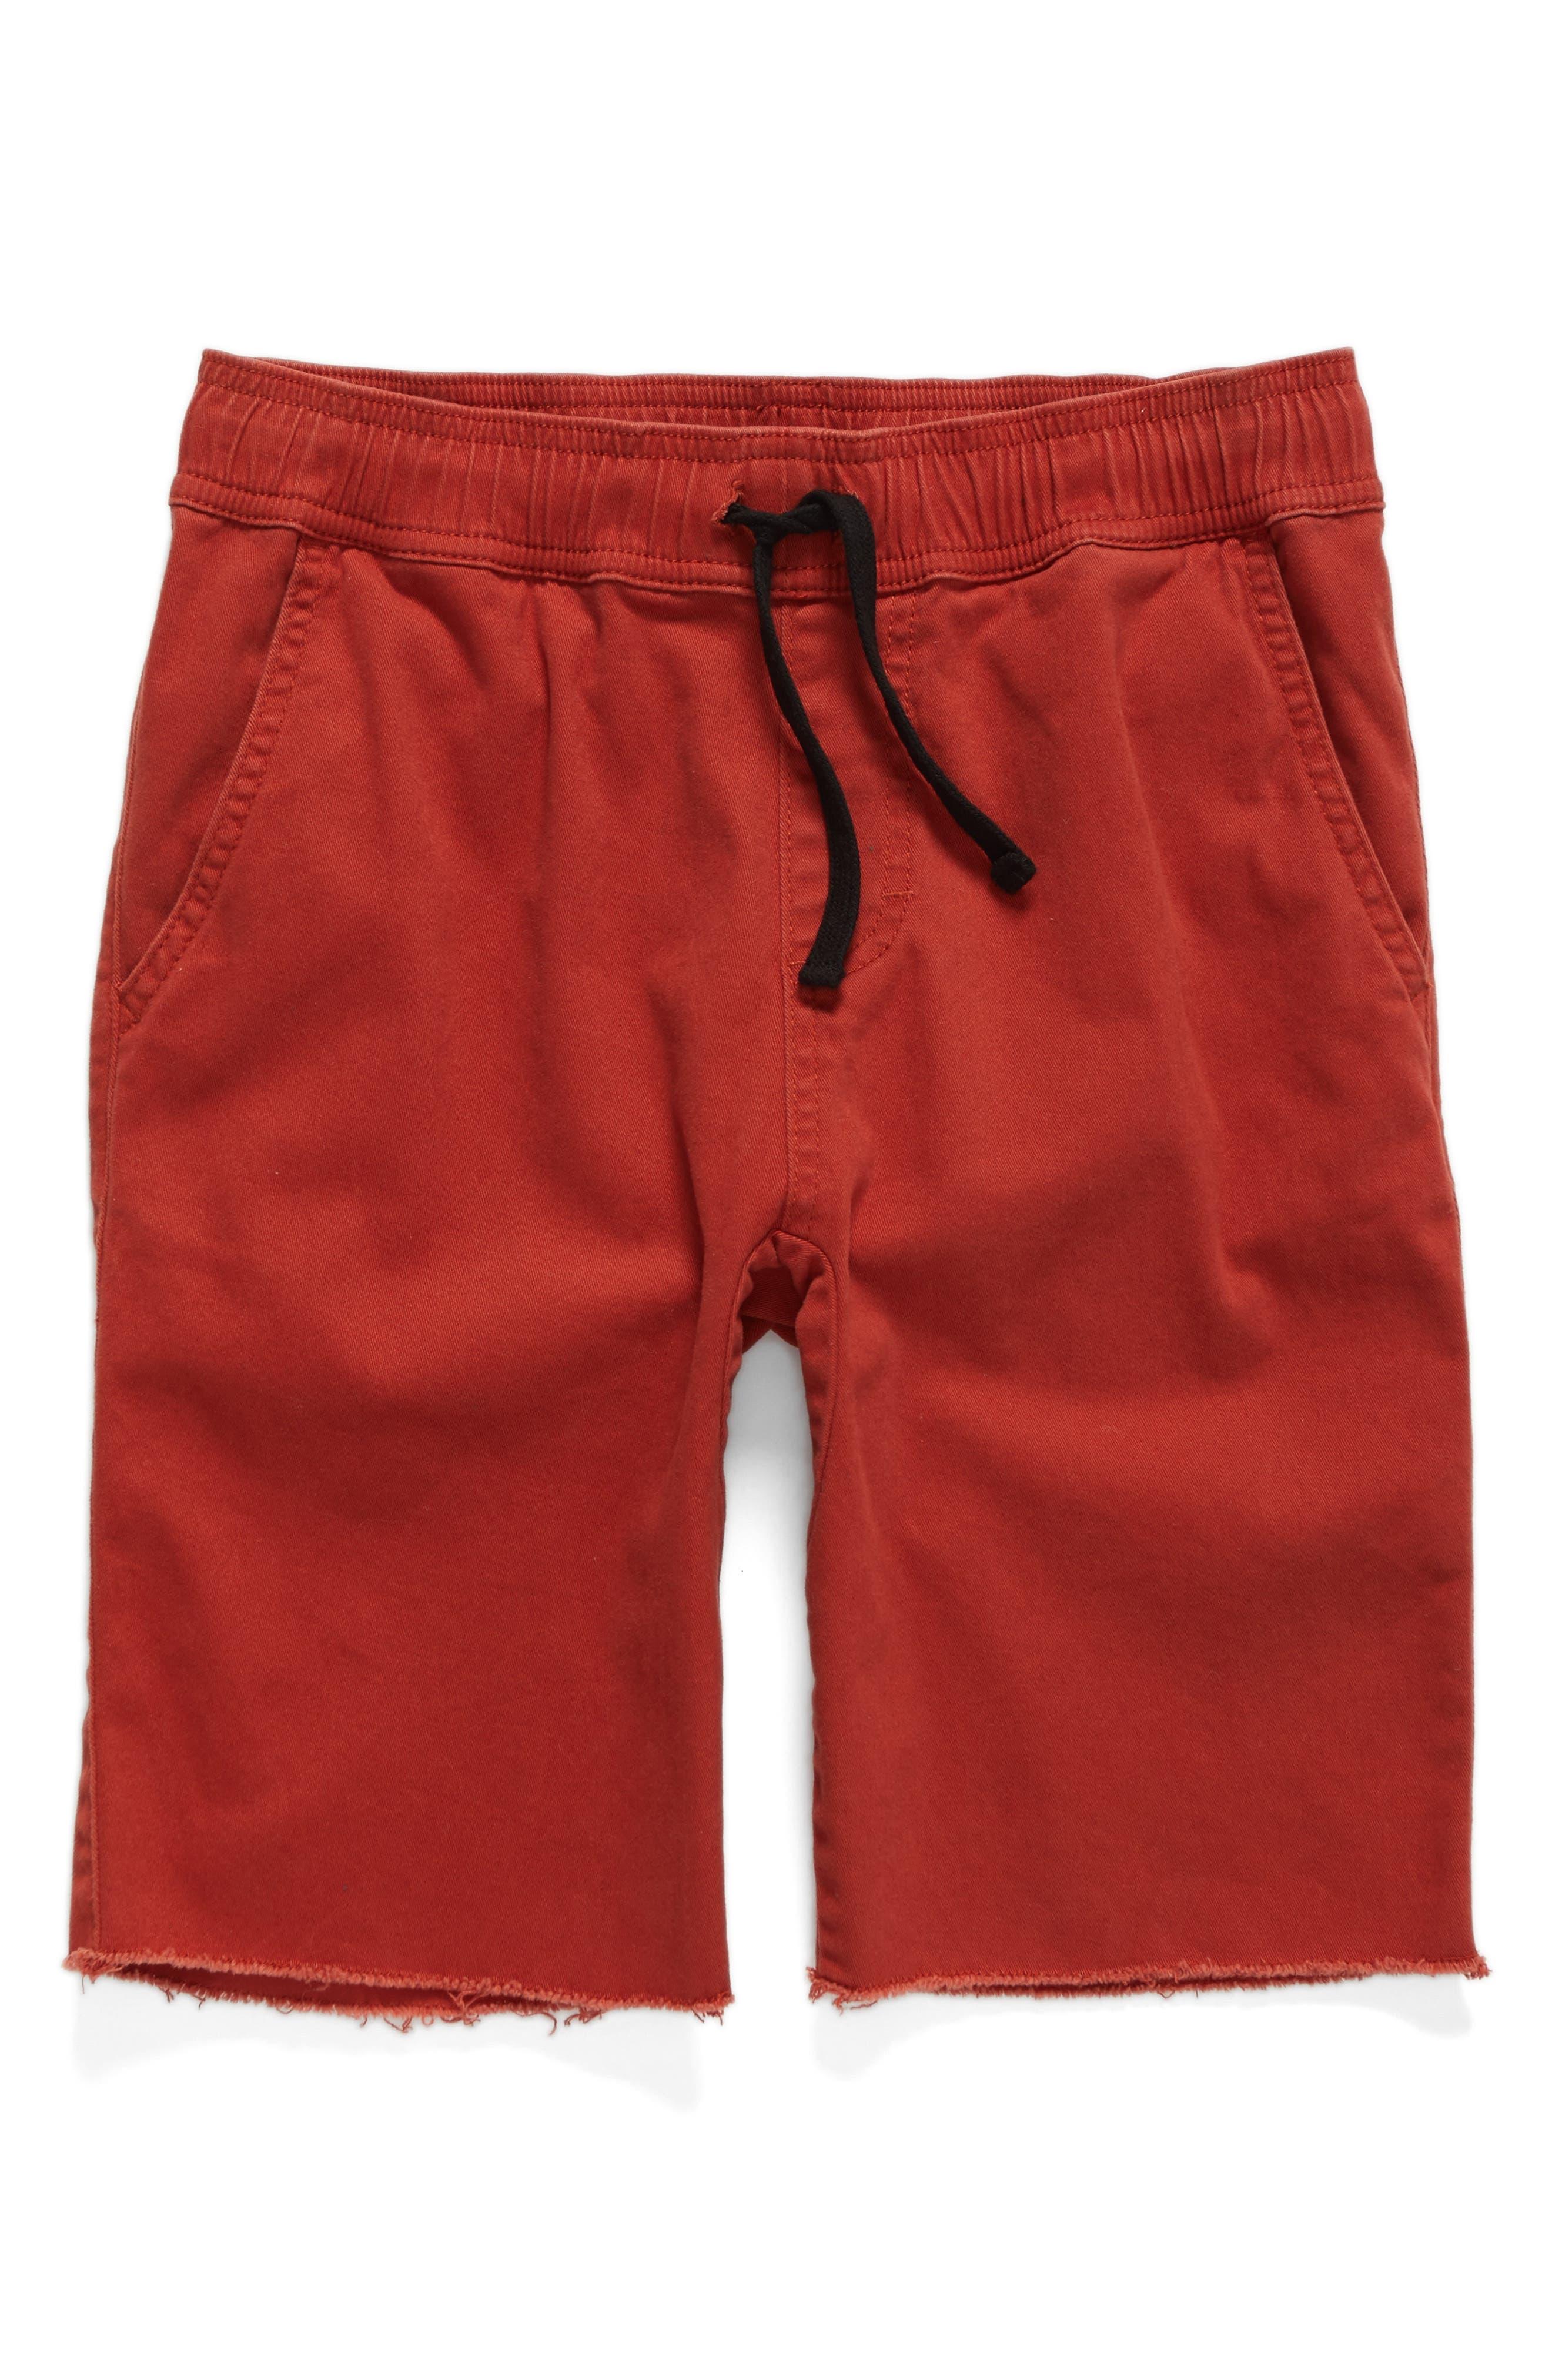 Jogger Shorts,                         Main,                         color, Red Ochre